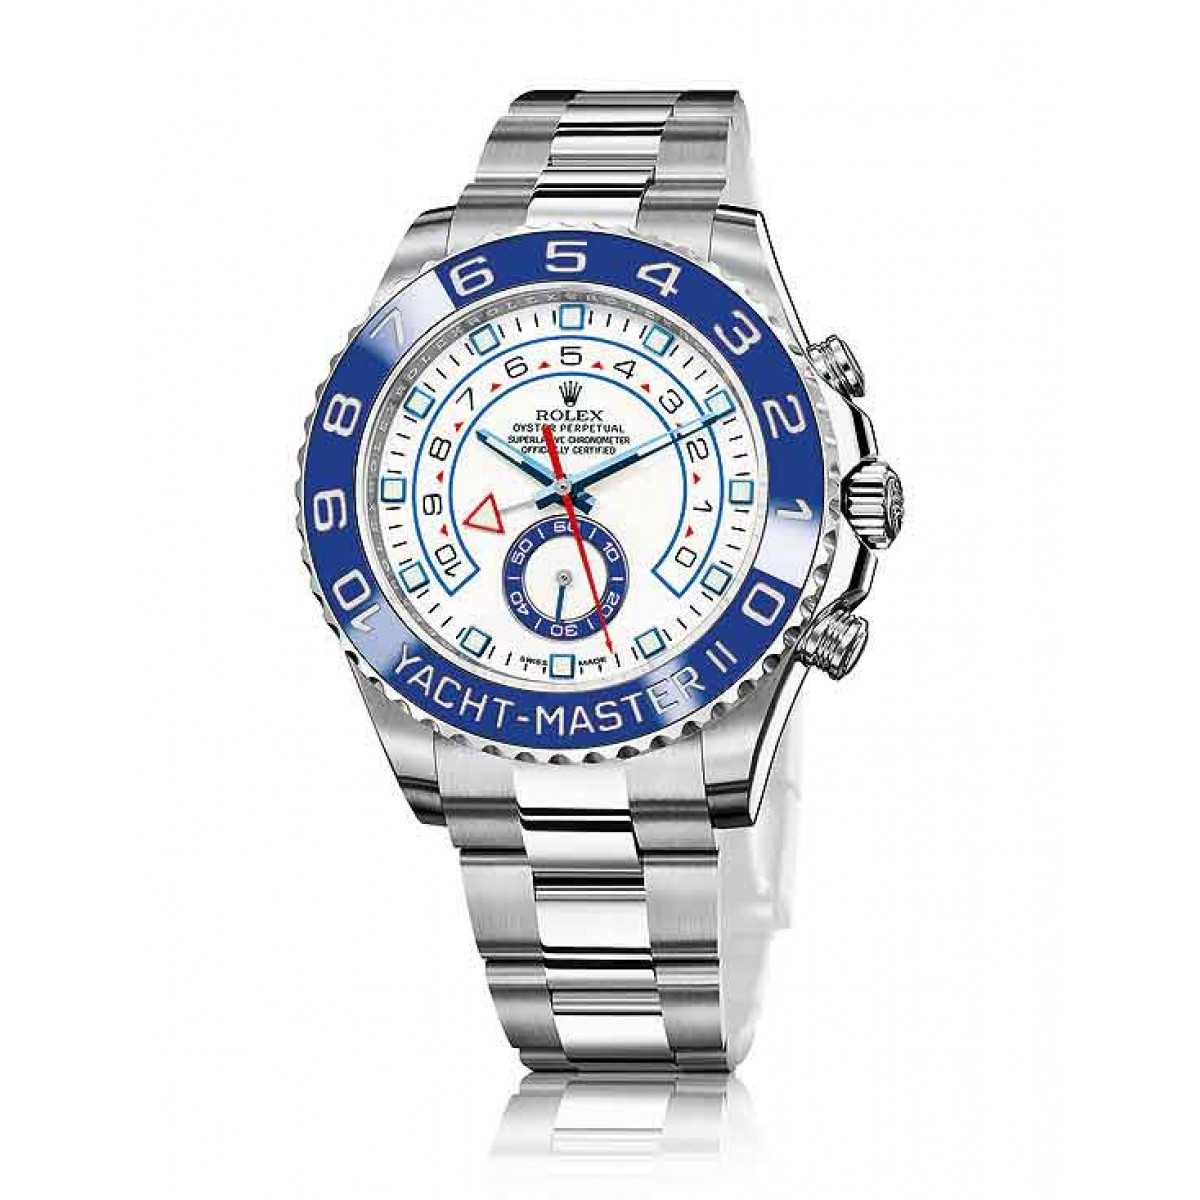 7dc2f93a99c Relógio Réplica Rolex Oyster Yacht Master II